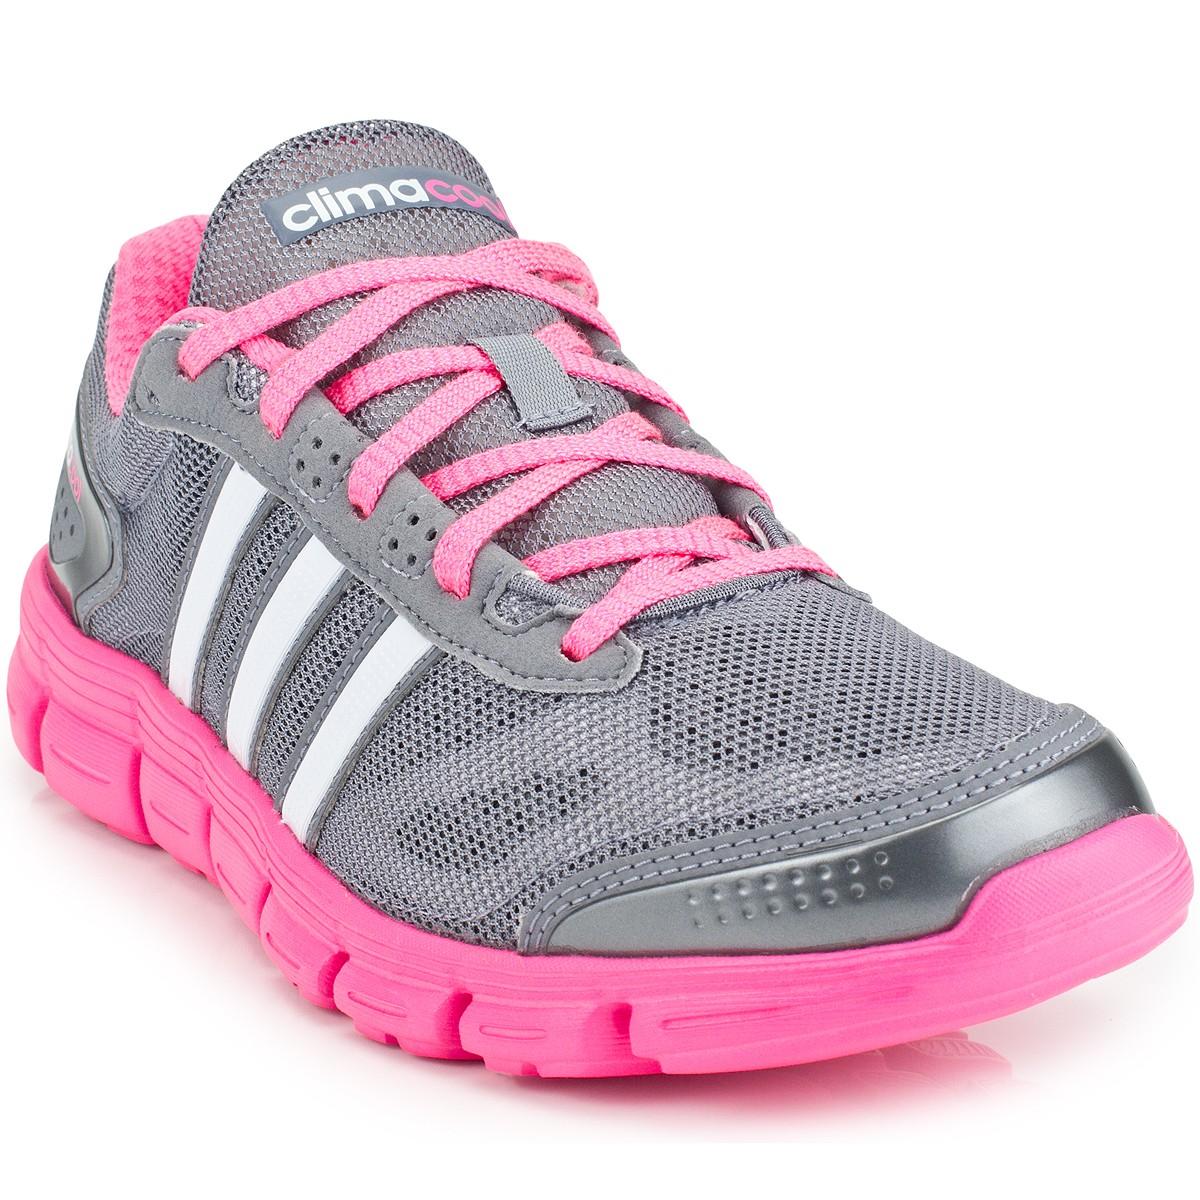 tenis adidas rosa e cinza